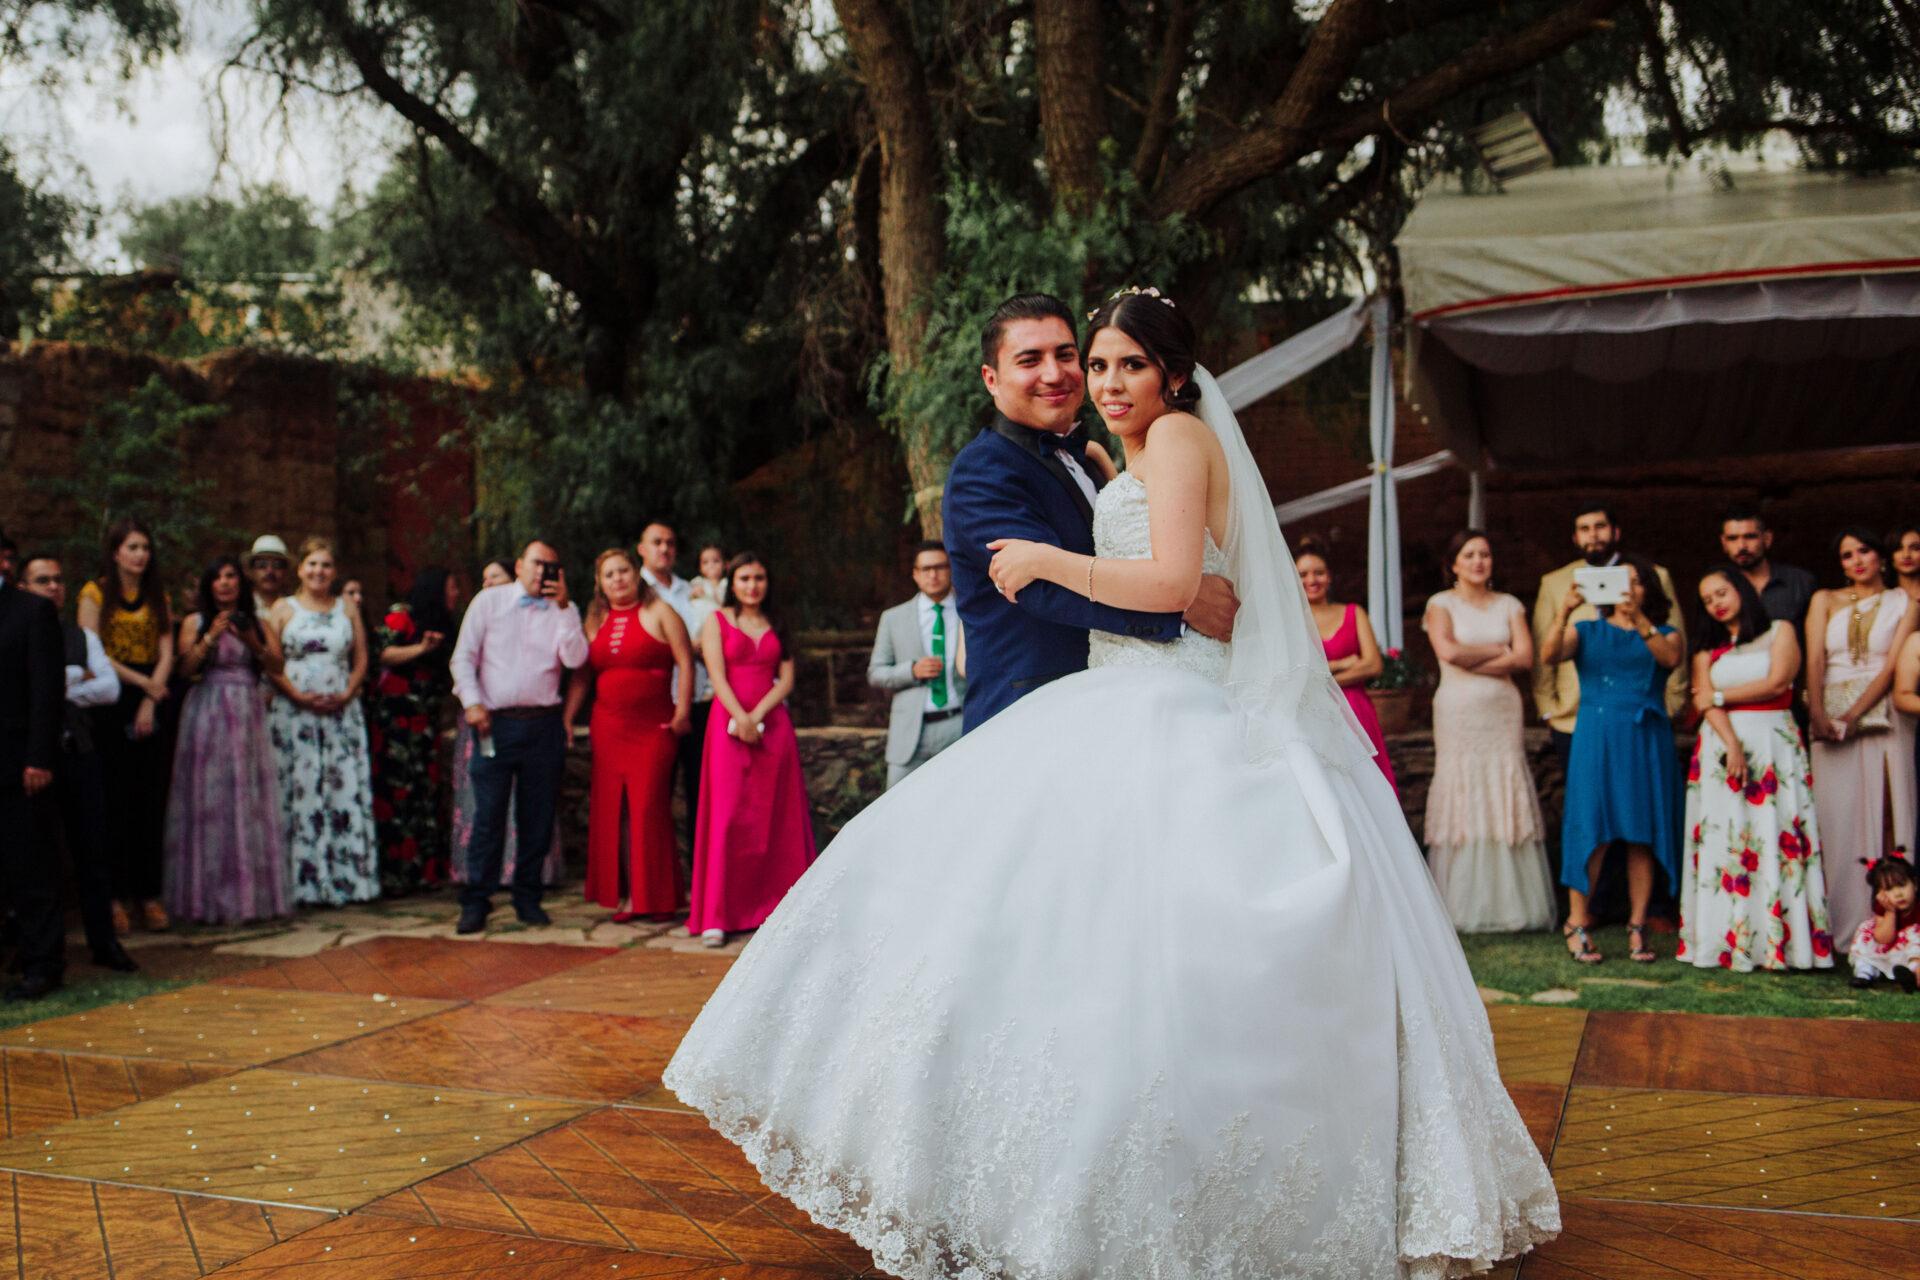 javier_noriega_fotografo_bodas_exhacienda_las_mercedes_zacatecas_wedding_photographer15a